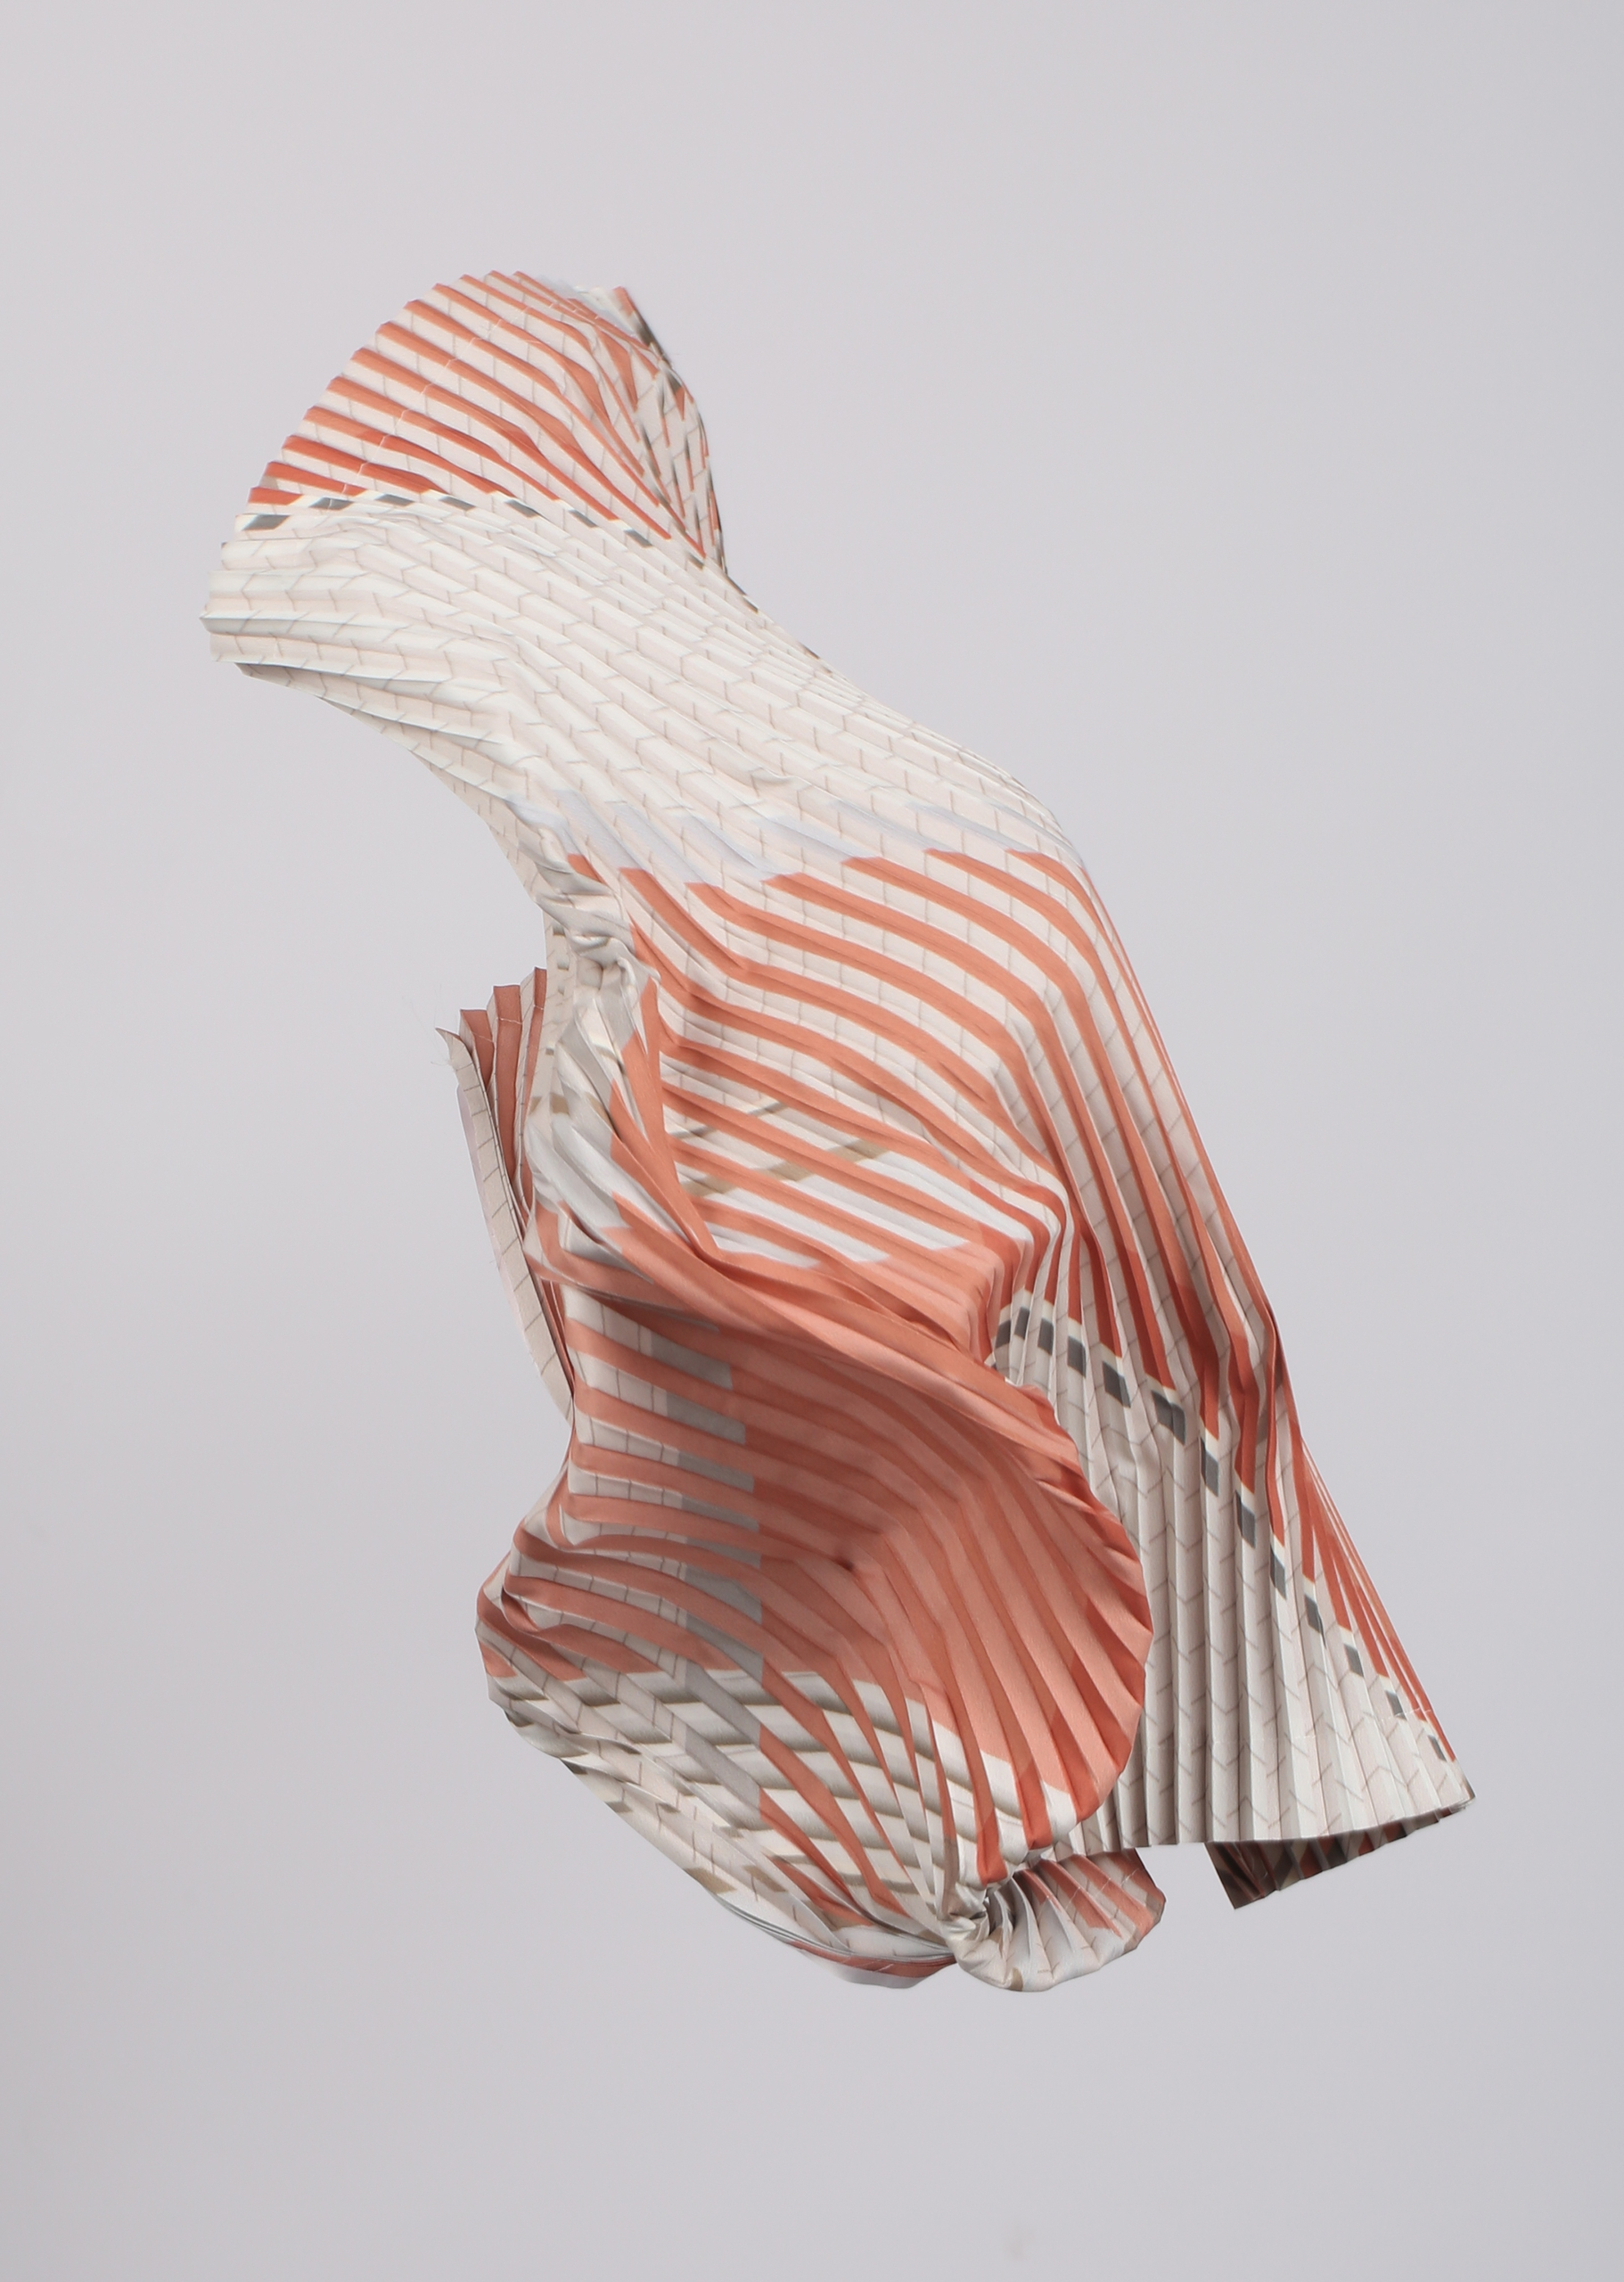 textiles created final project  - rosetal | ello